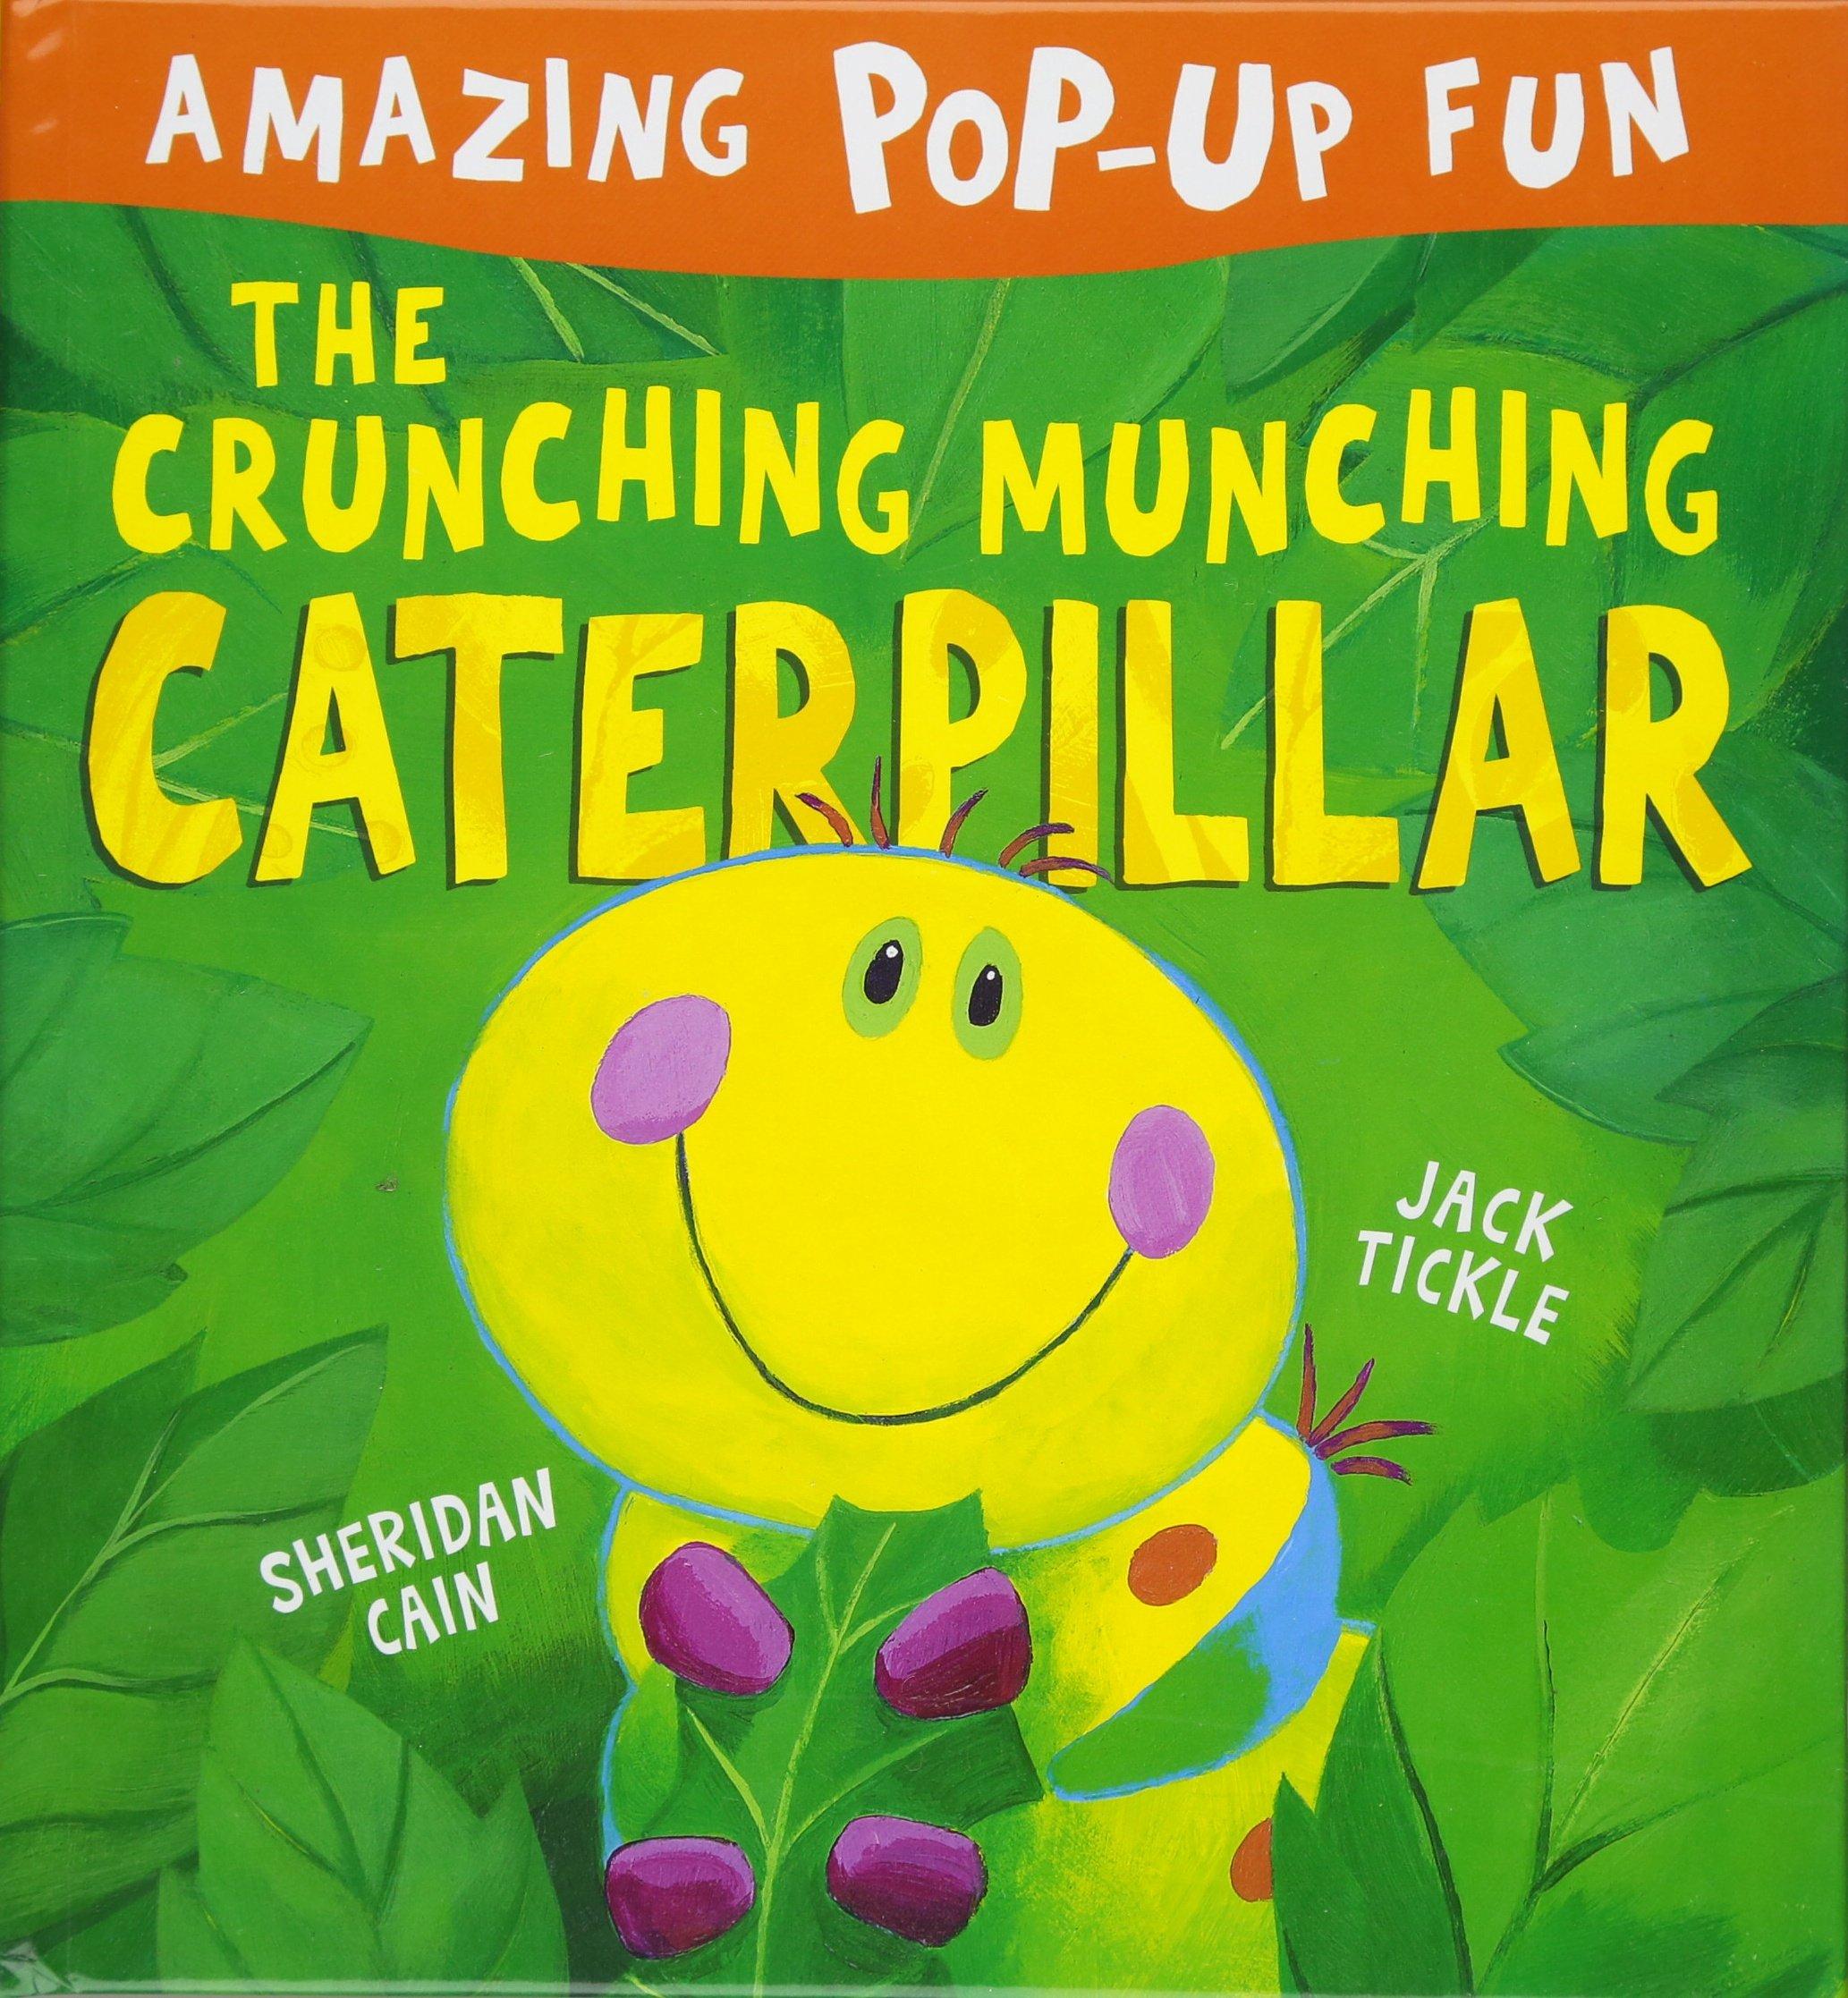 The Crunching Munching Caterpillar ebook